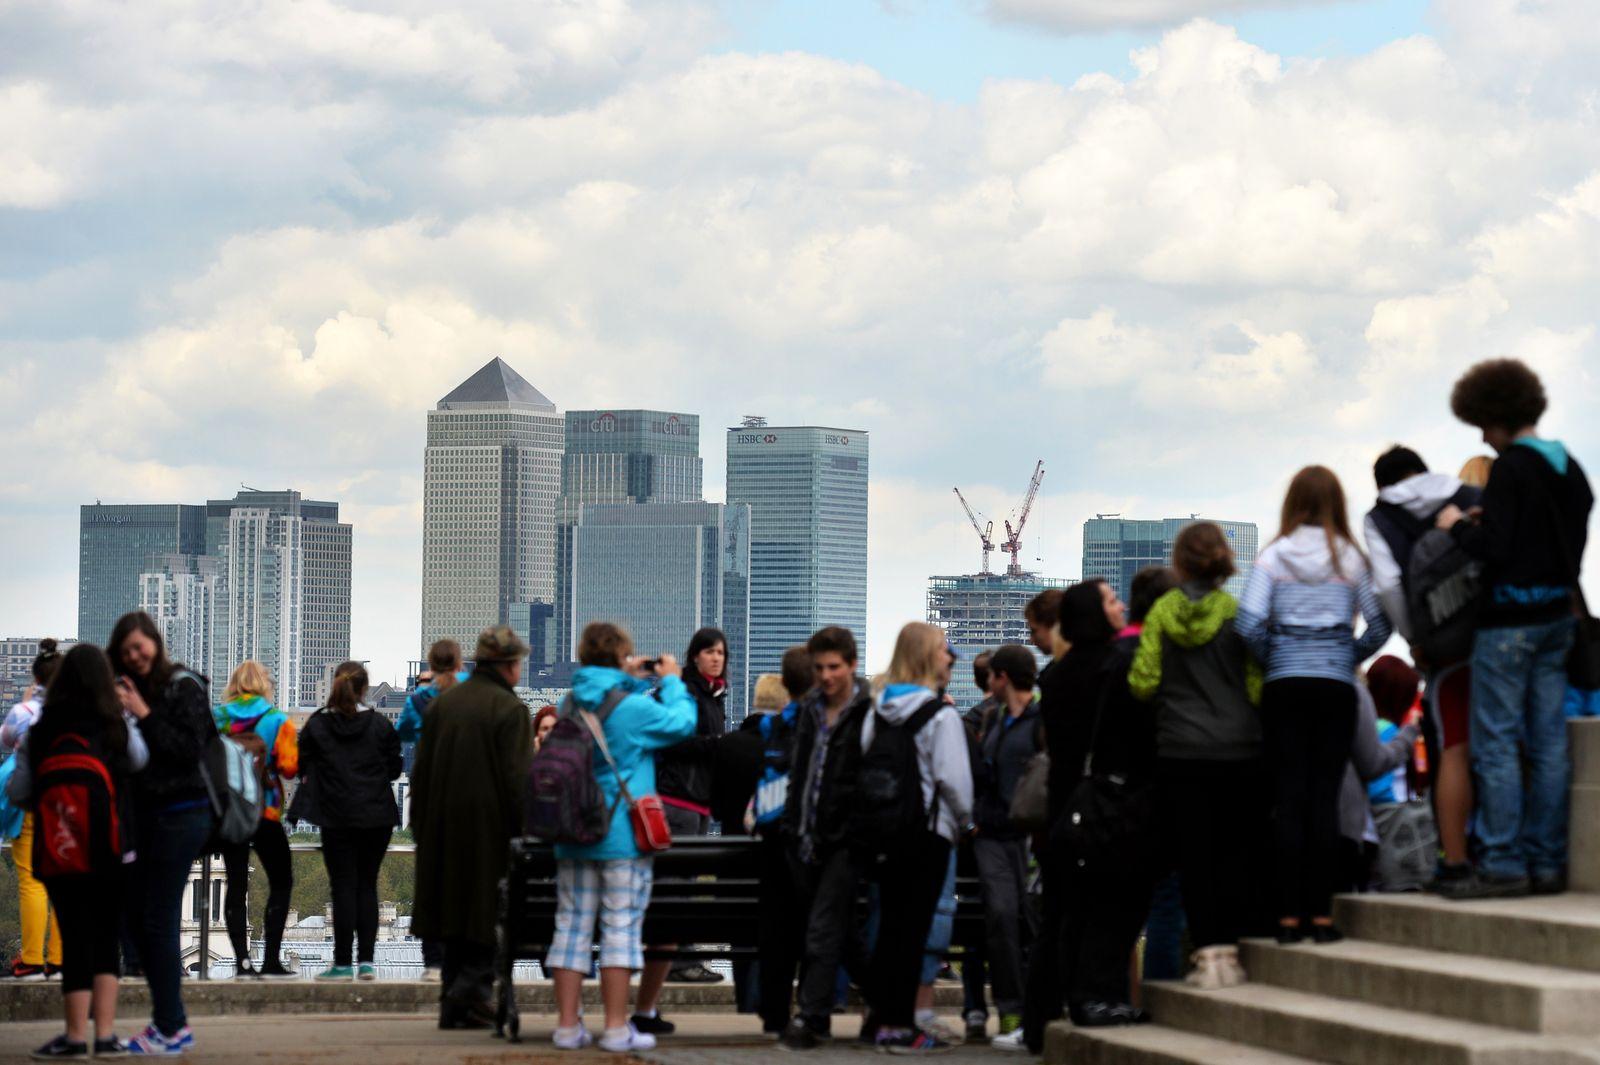 England / London / Banken-Viertel / Banken / Banker / Finanz-sektor /